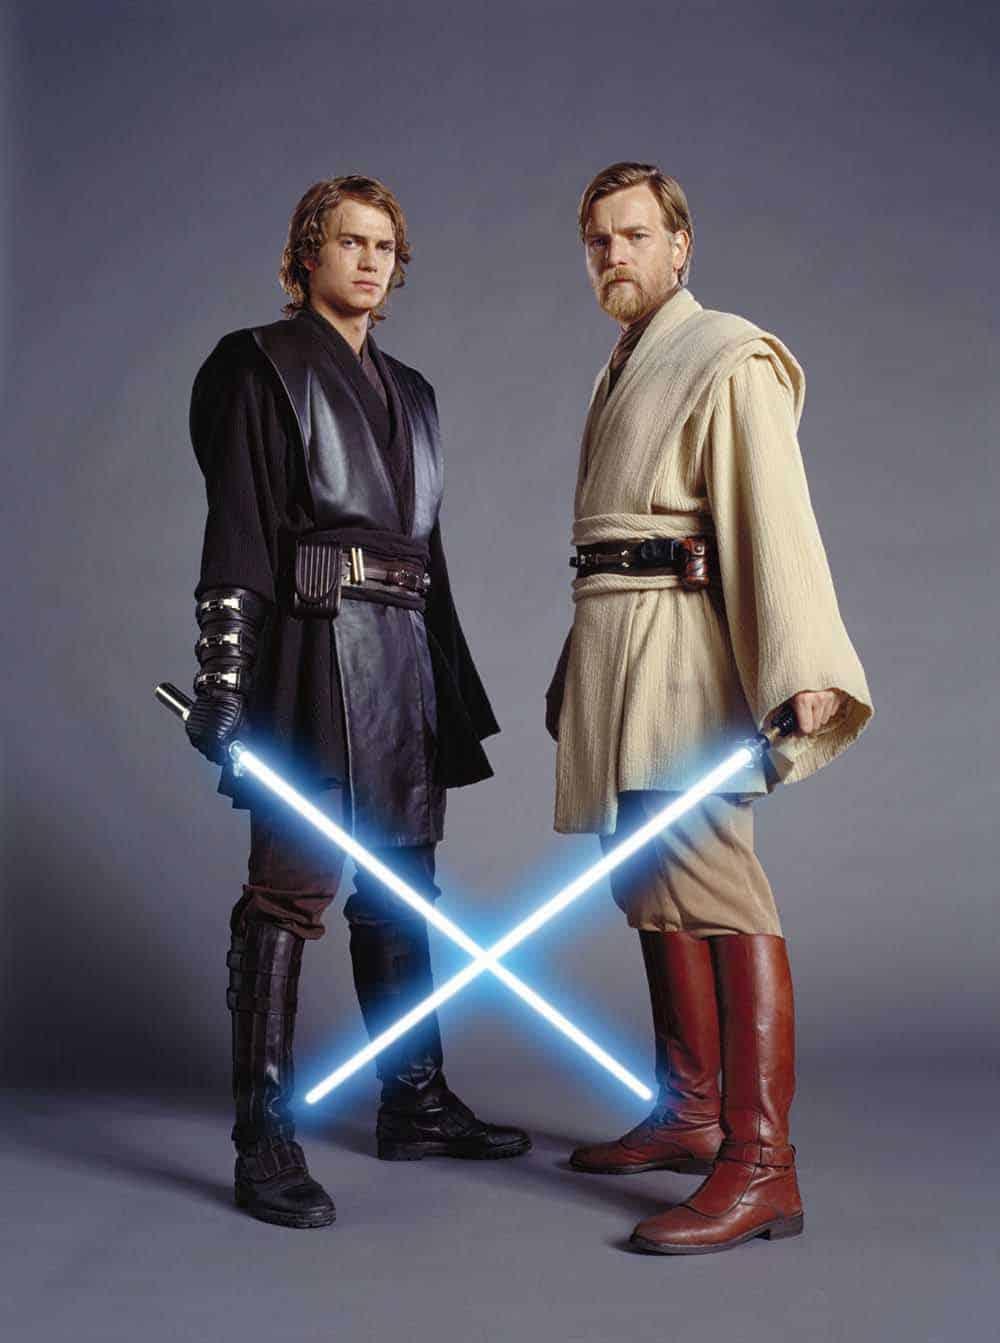 obi wan kenobi anakin skywalker